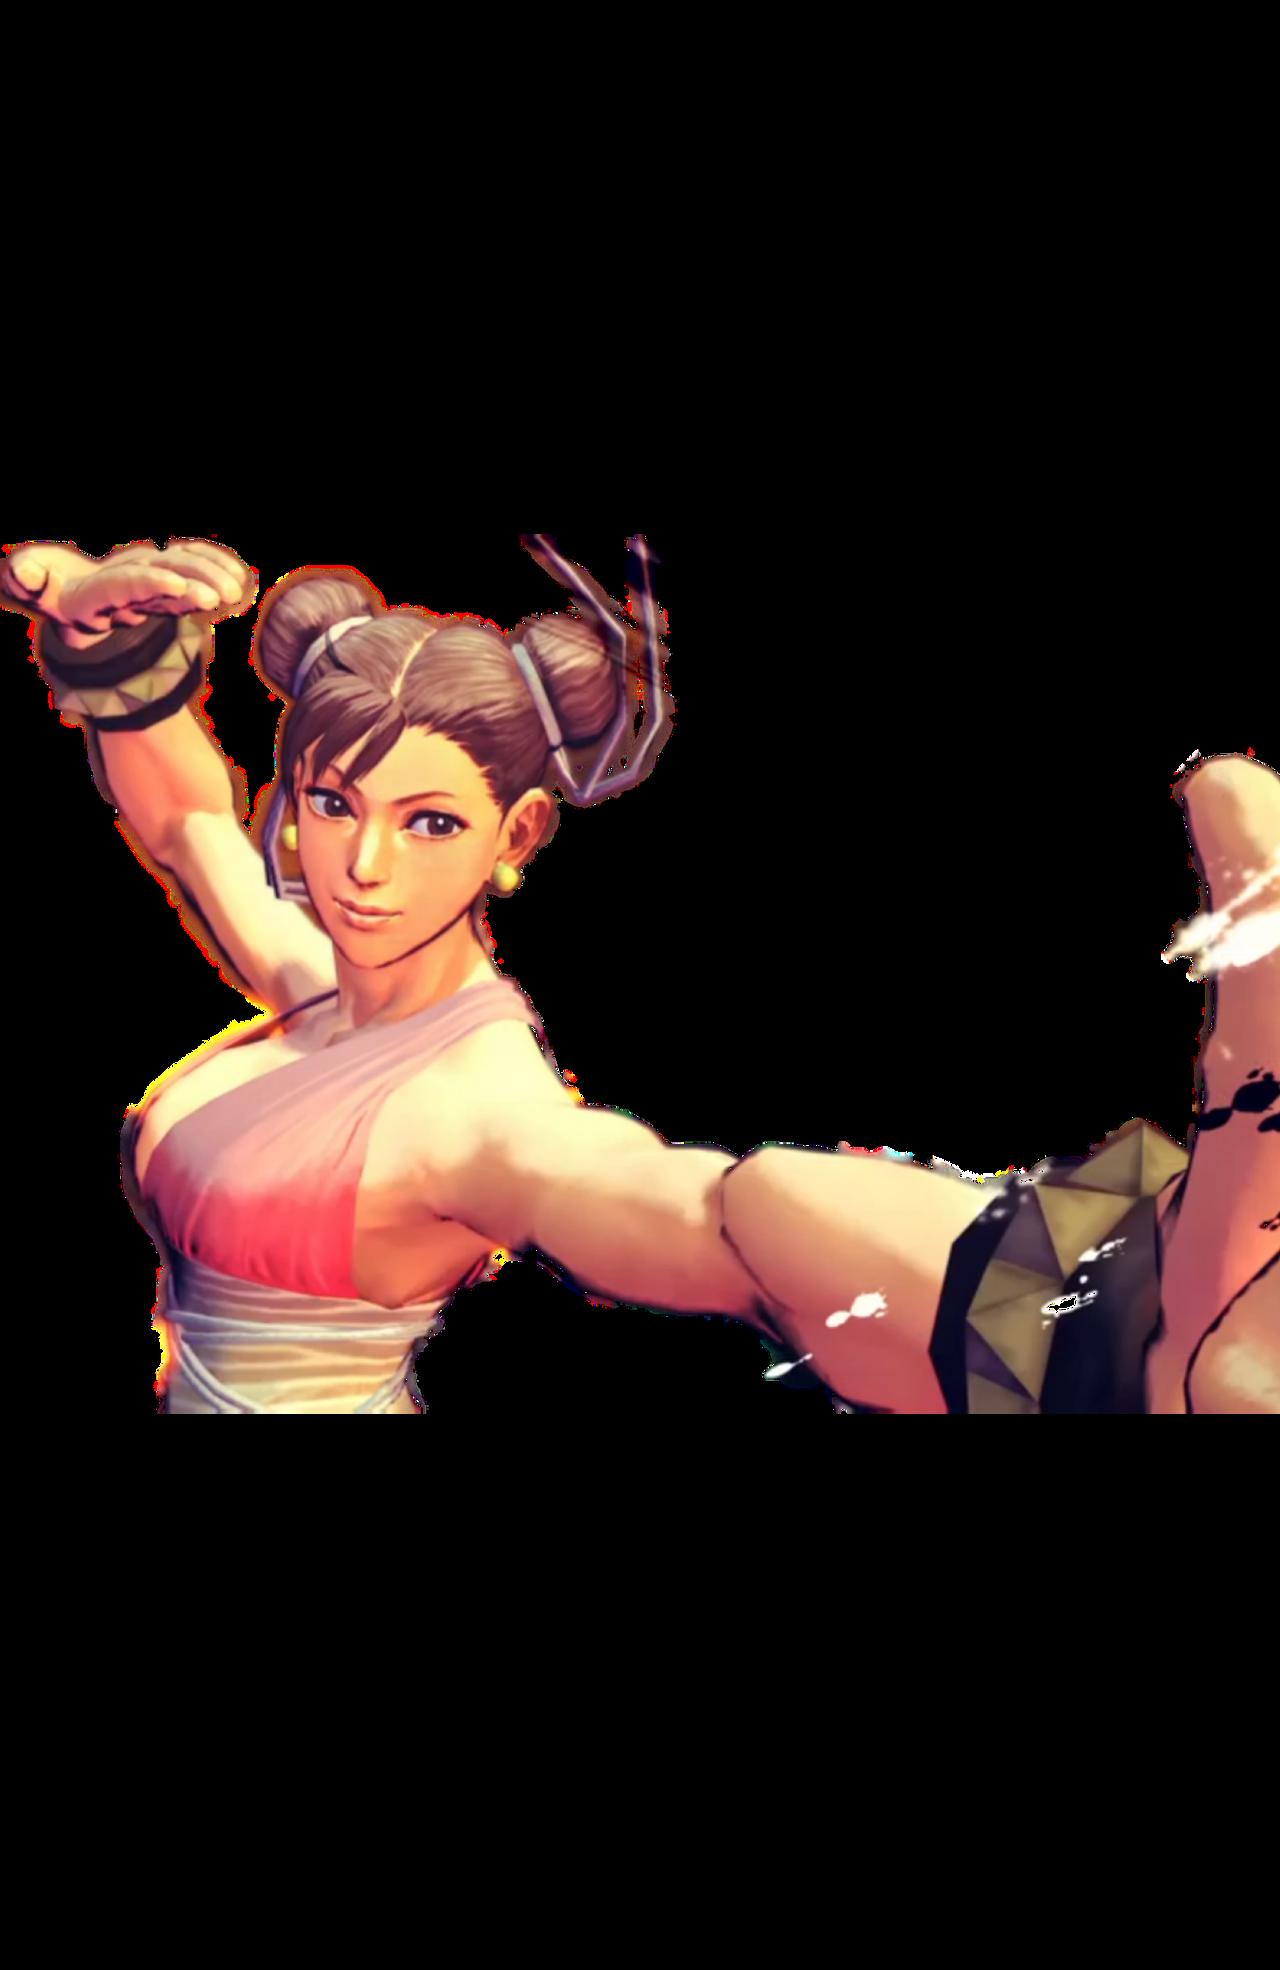 Street Fighter Iv Chun Li Alternate Costume 1 By Secasey1996 On